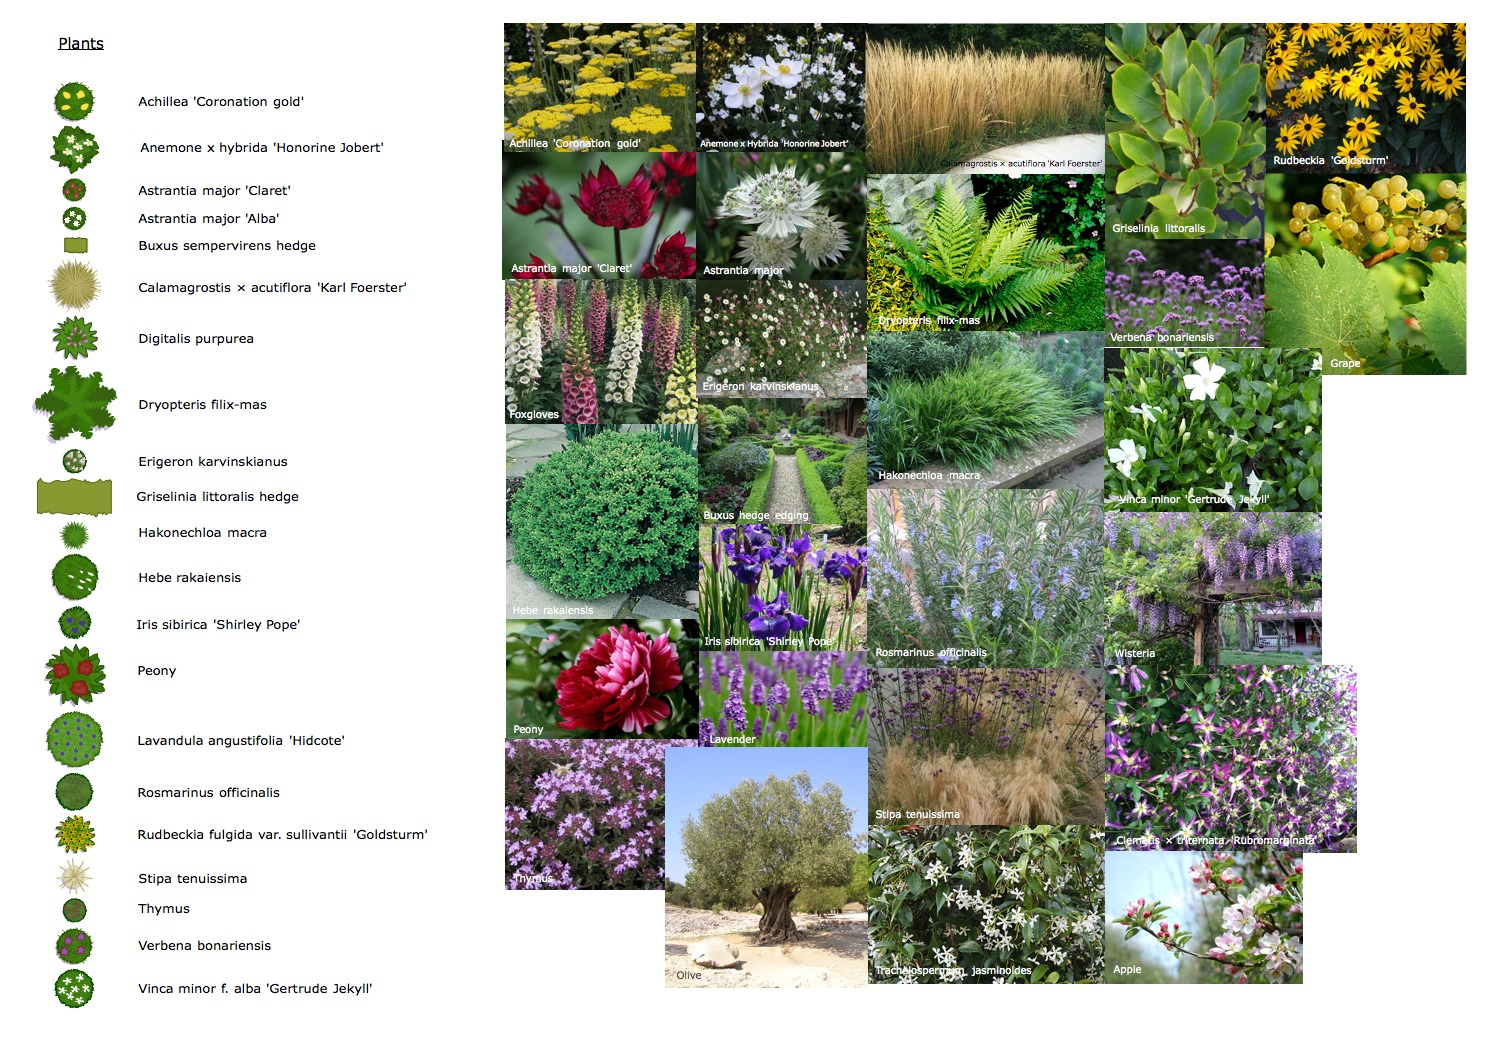 Bailey_plants.jpg